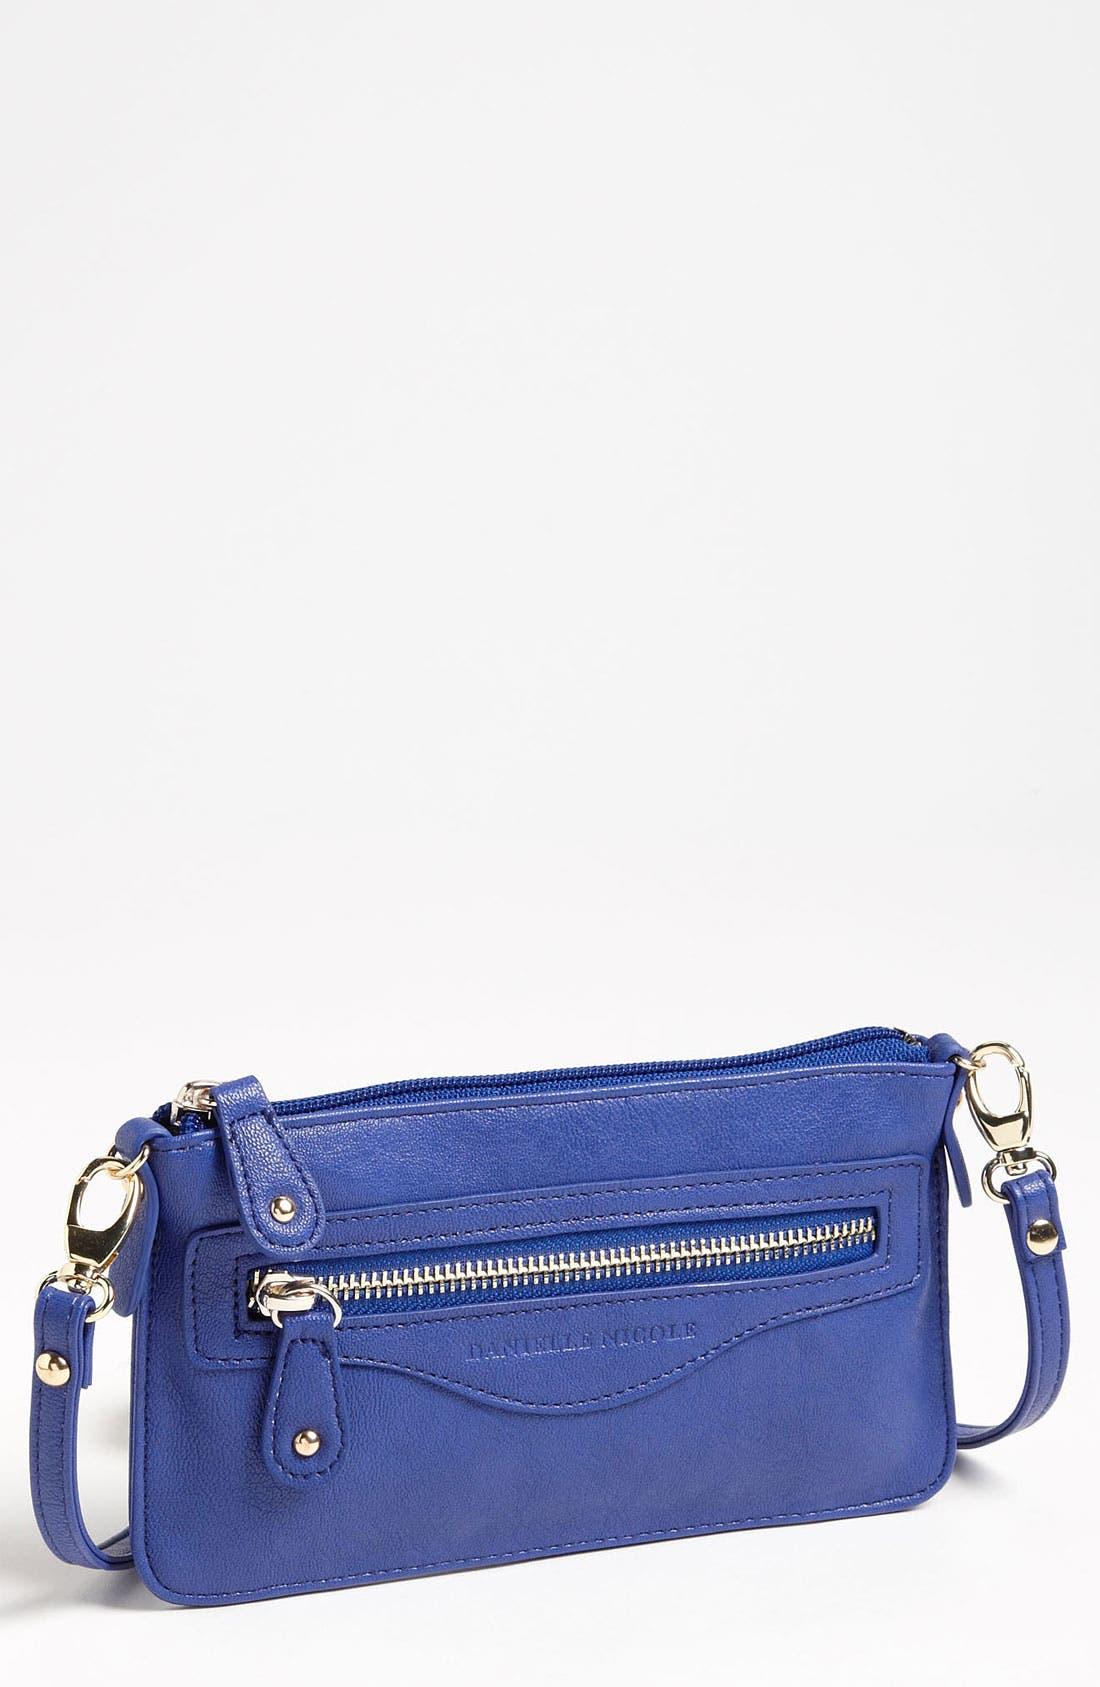 Main Image - Danielle Nicole 'Davina' Crossbody Bag